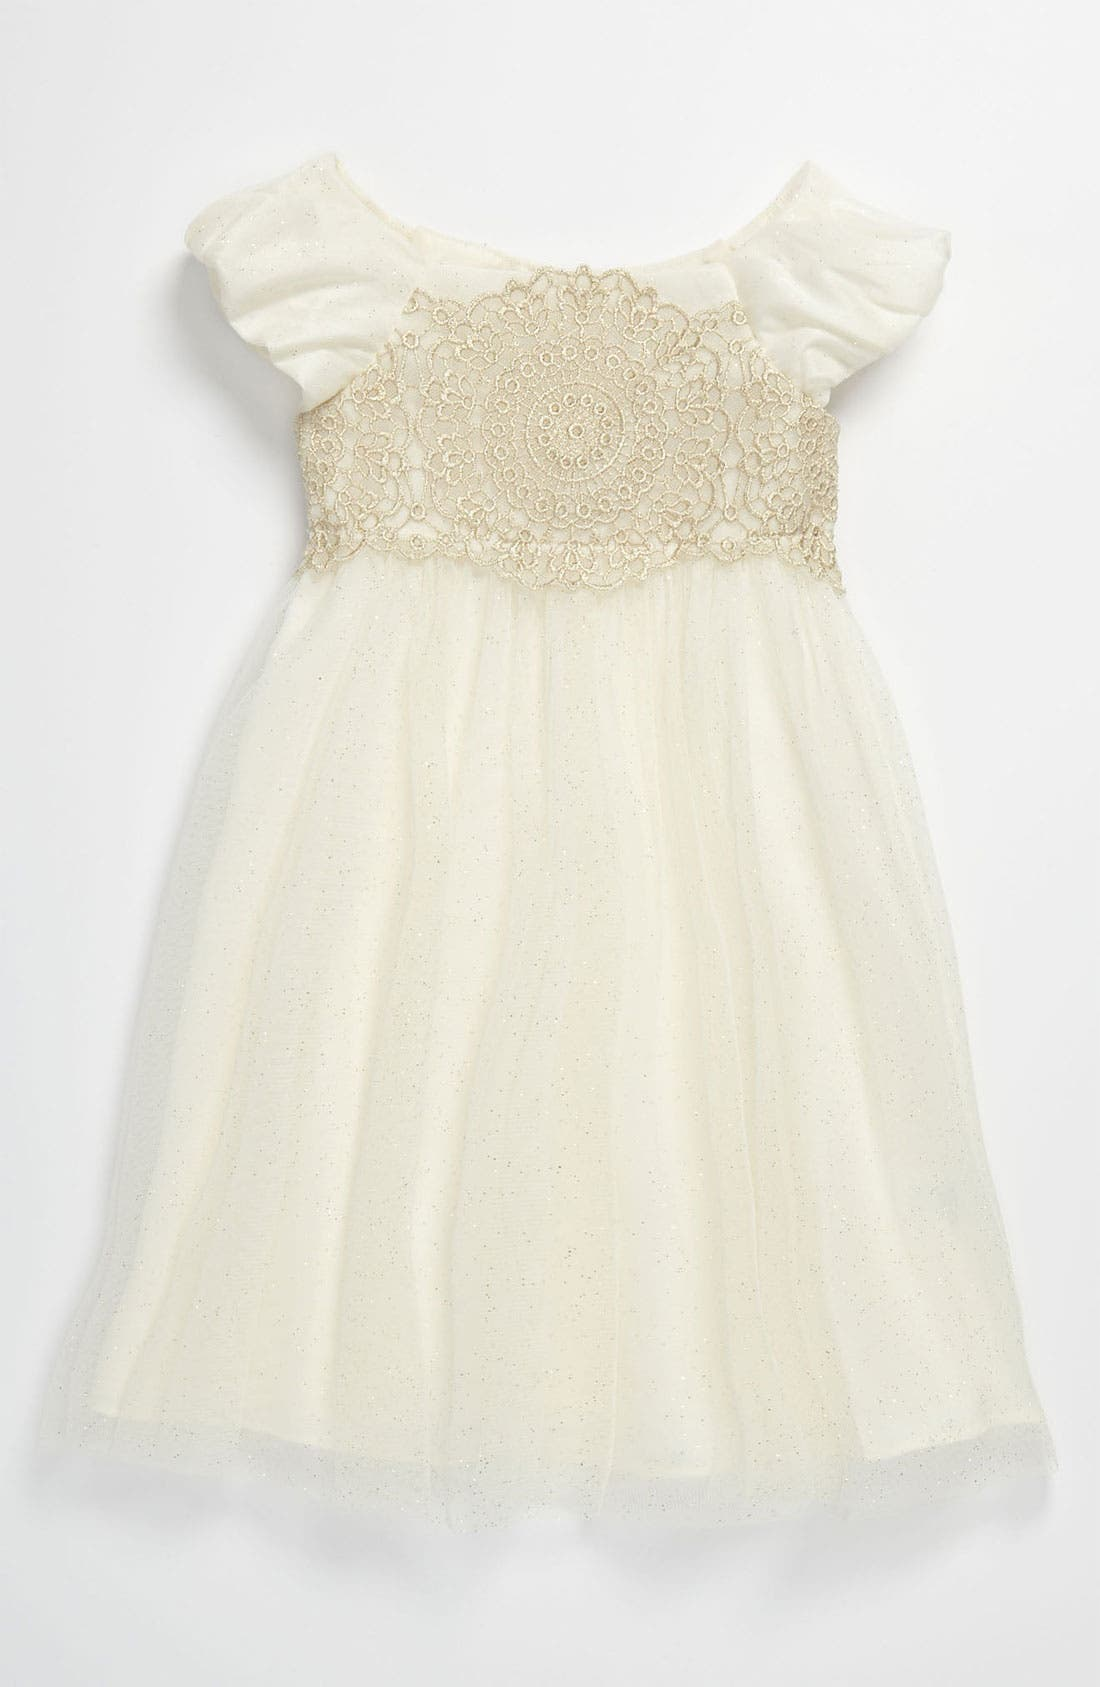 Alternate Image 1 Selected - Sweet Heart Rose Lace Empire Waist Glitter Dress (Toddler)